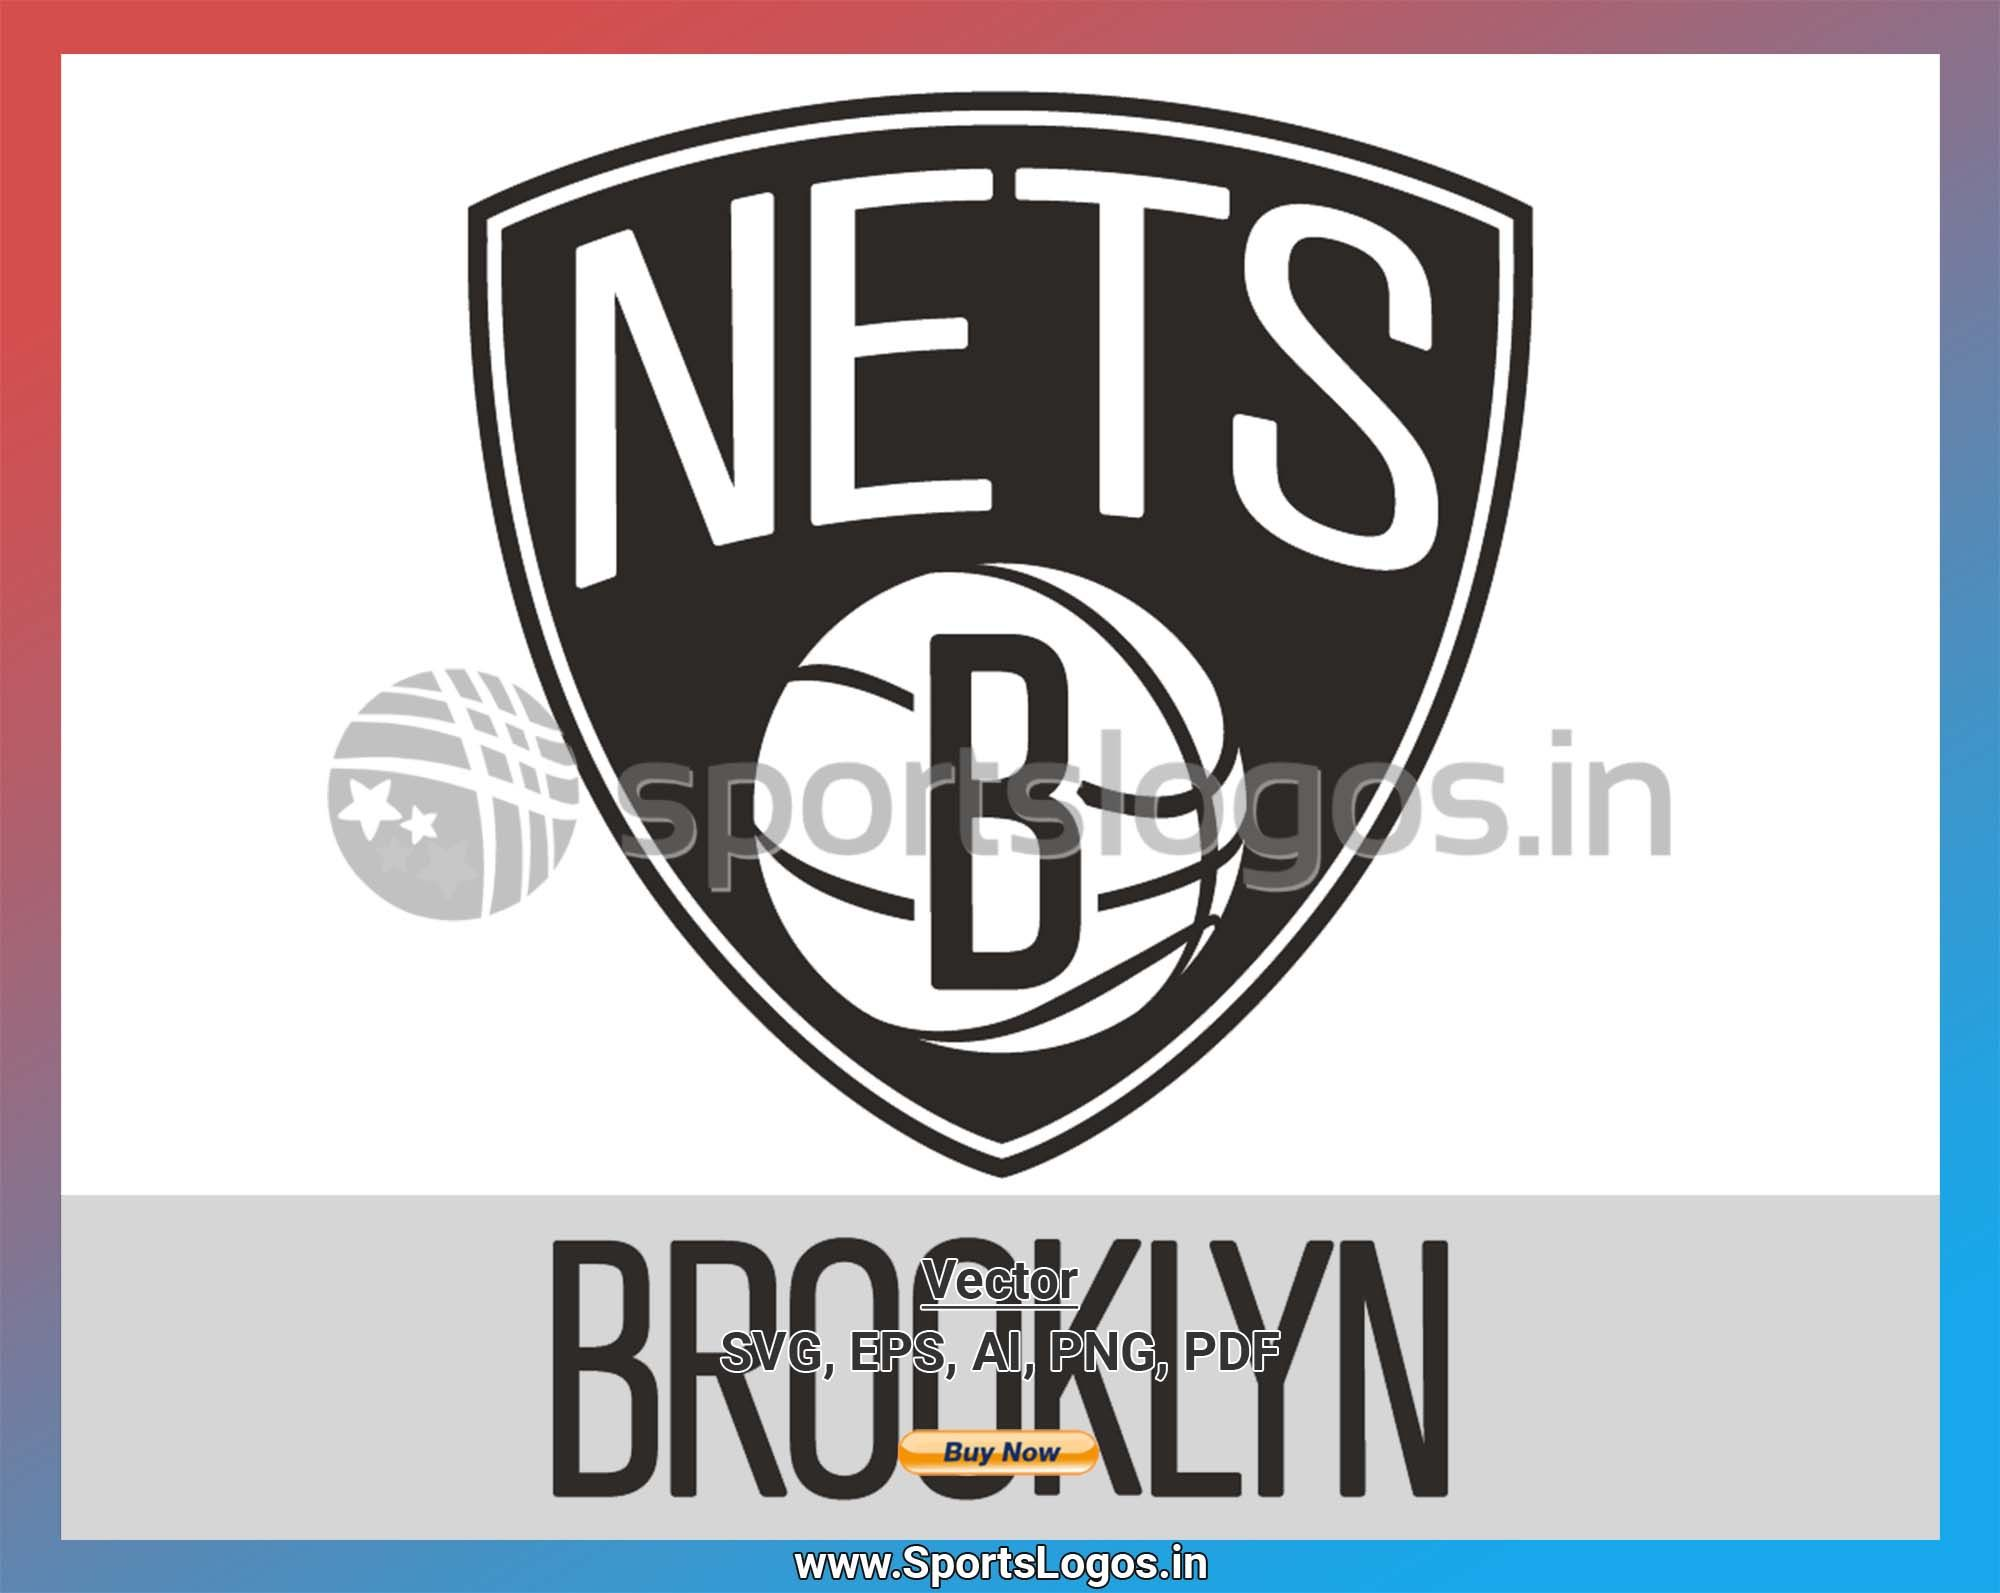 Brooklyn Nets 2012/13, National Basketball Association